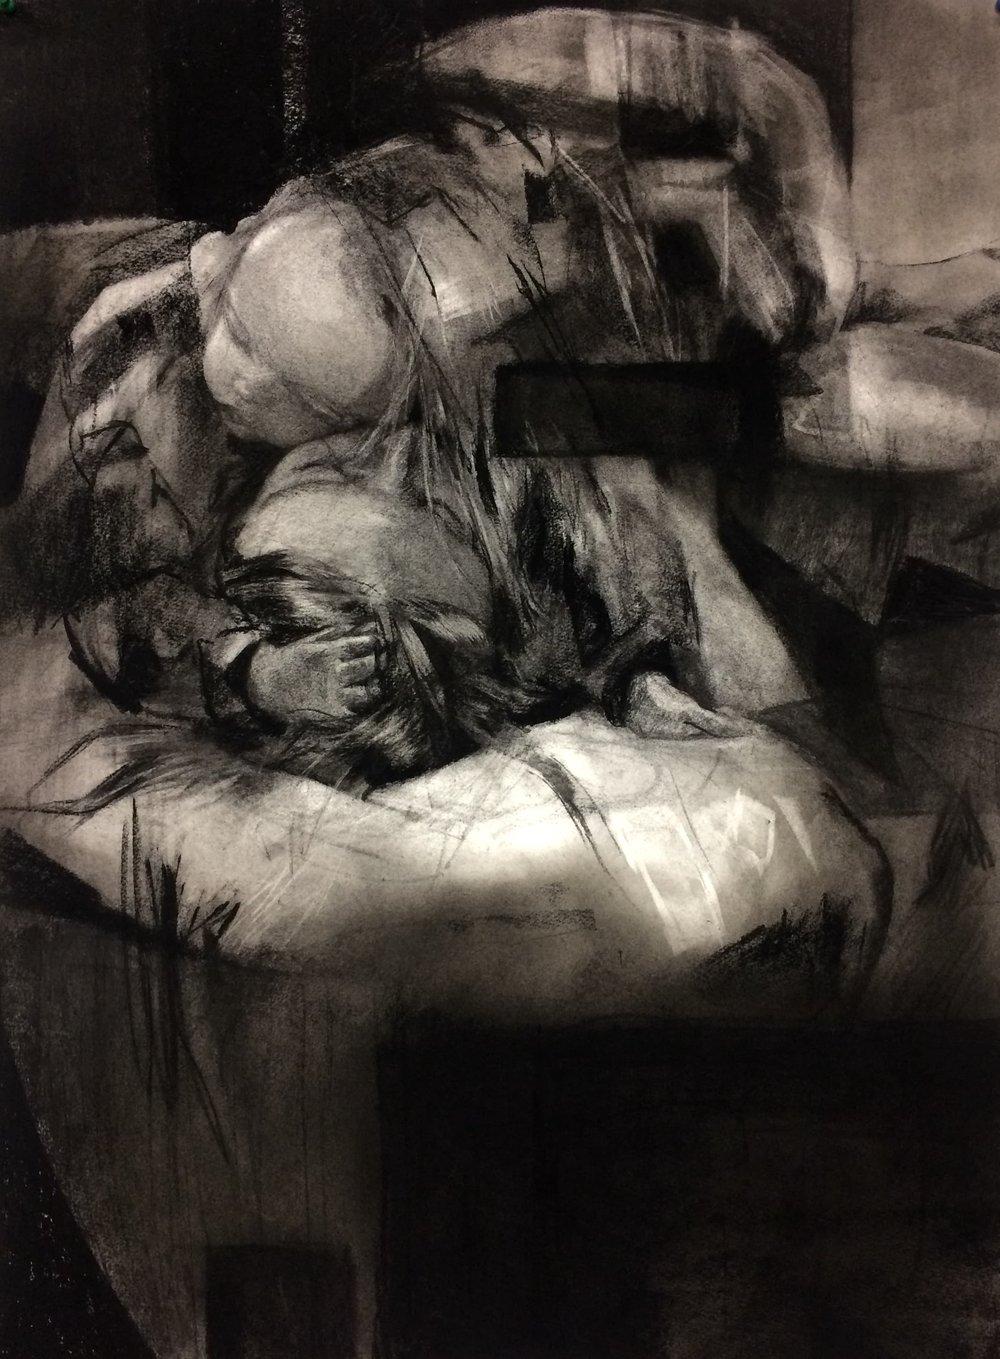 Broken night, charcoal on paper, 56 x 76cm